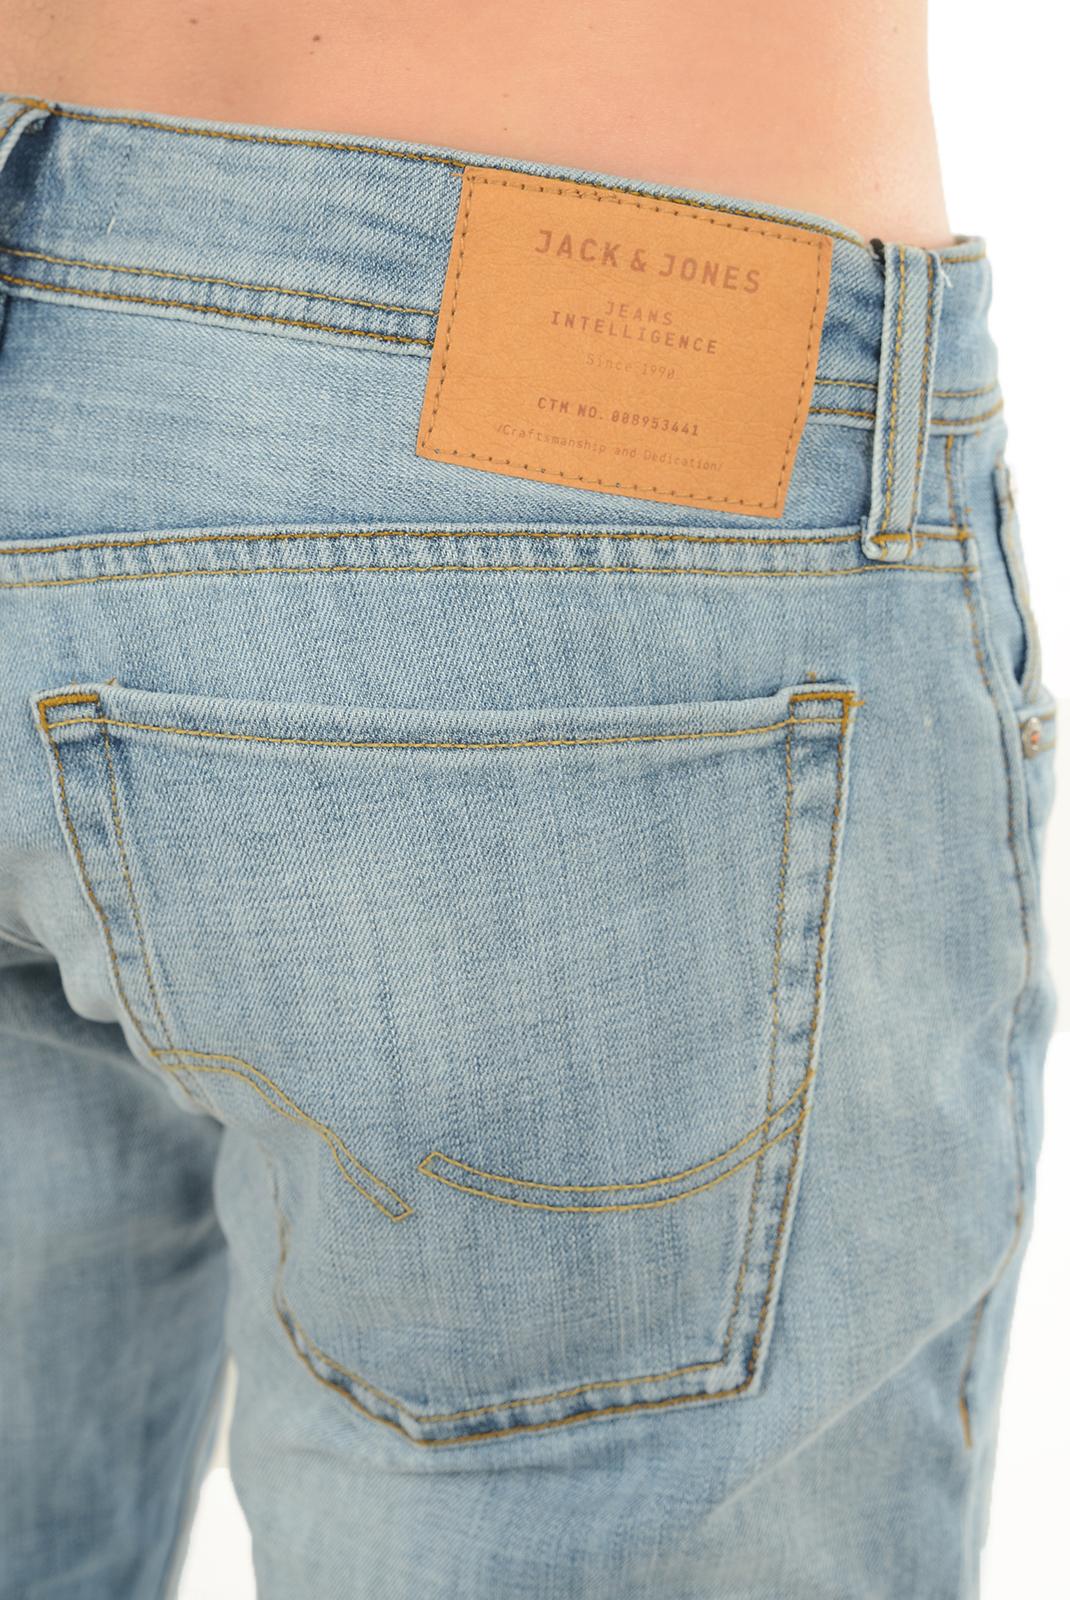 Jeans  Jack & Jones TIM ORIGINAL GE 987 BLUE DENIM